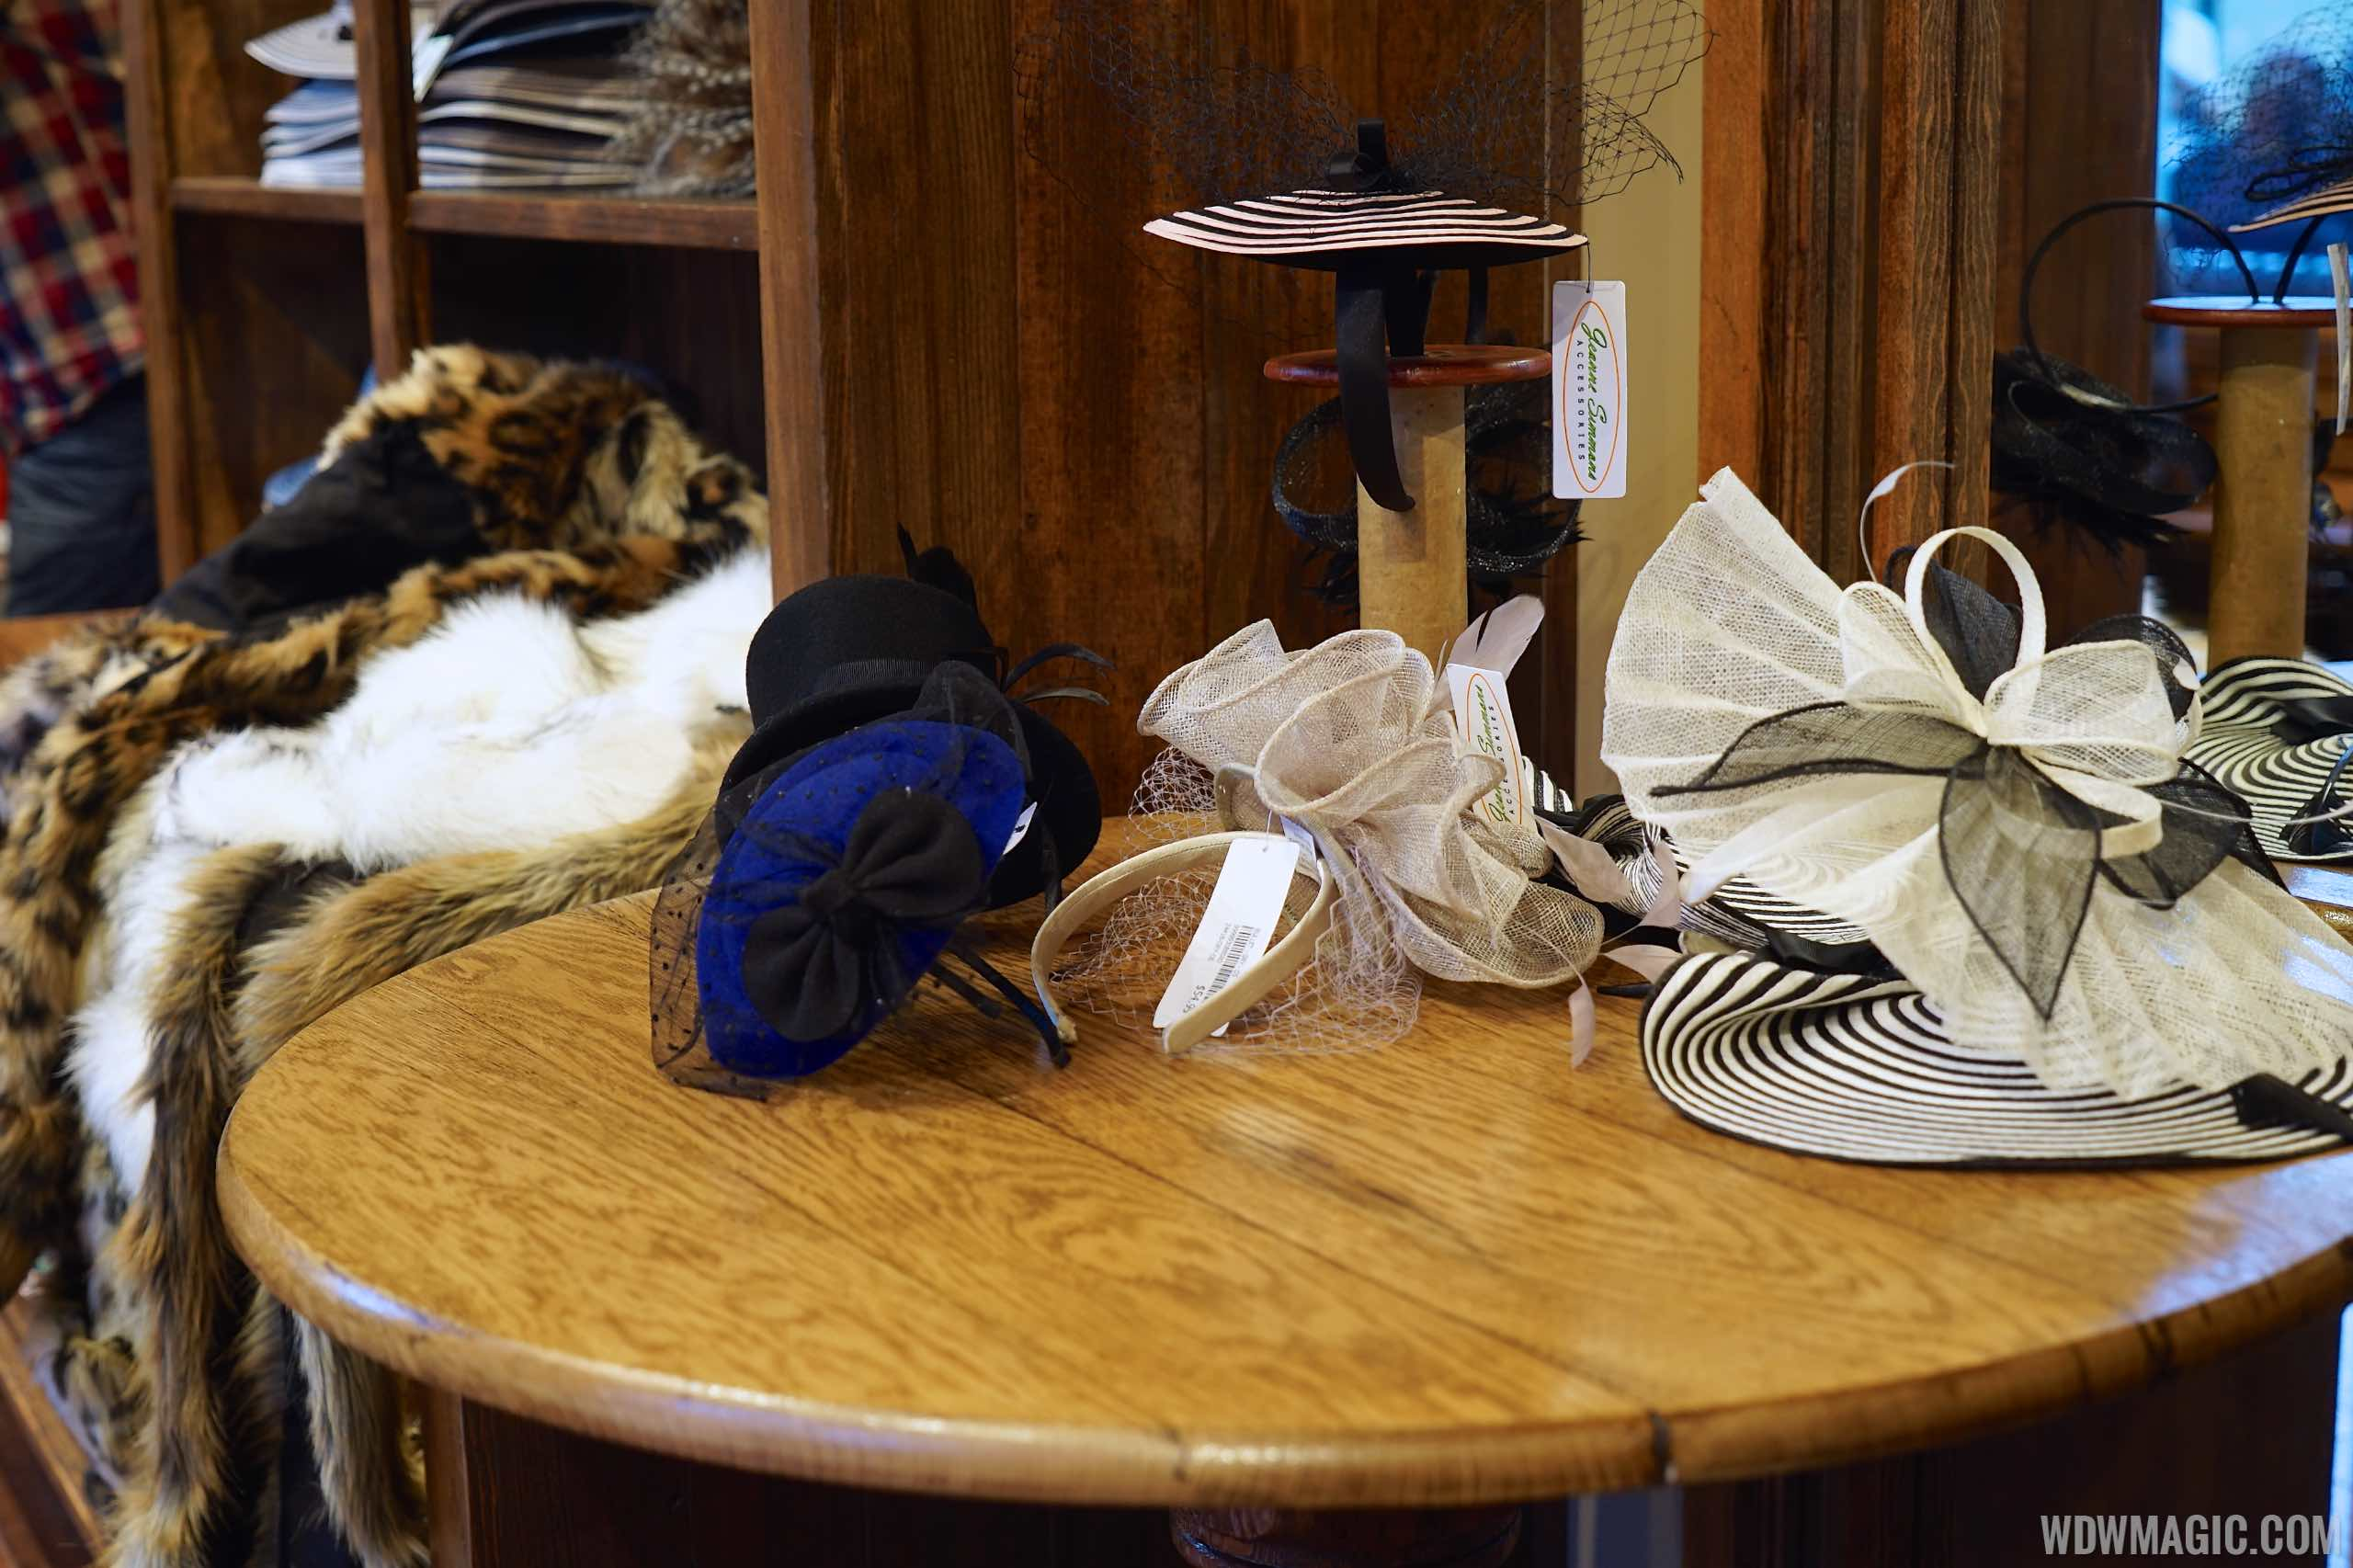 Chapel Hats - Hat display